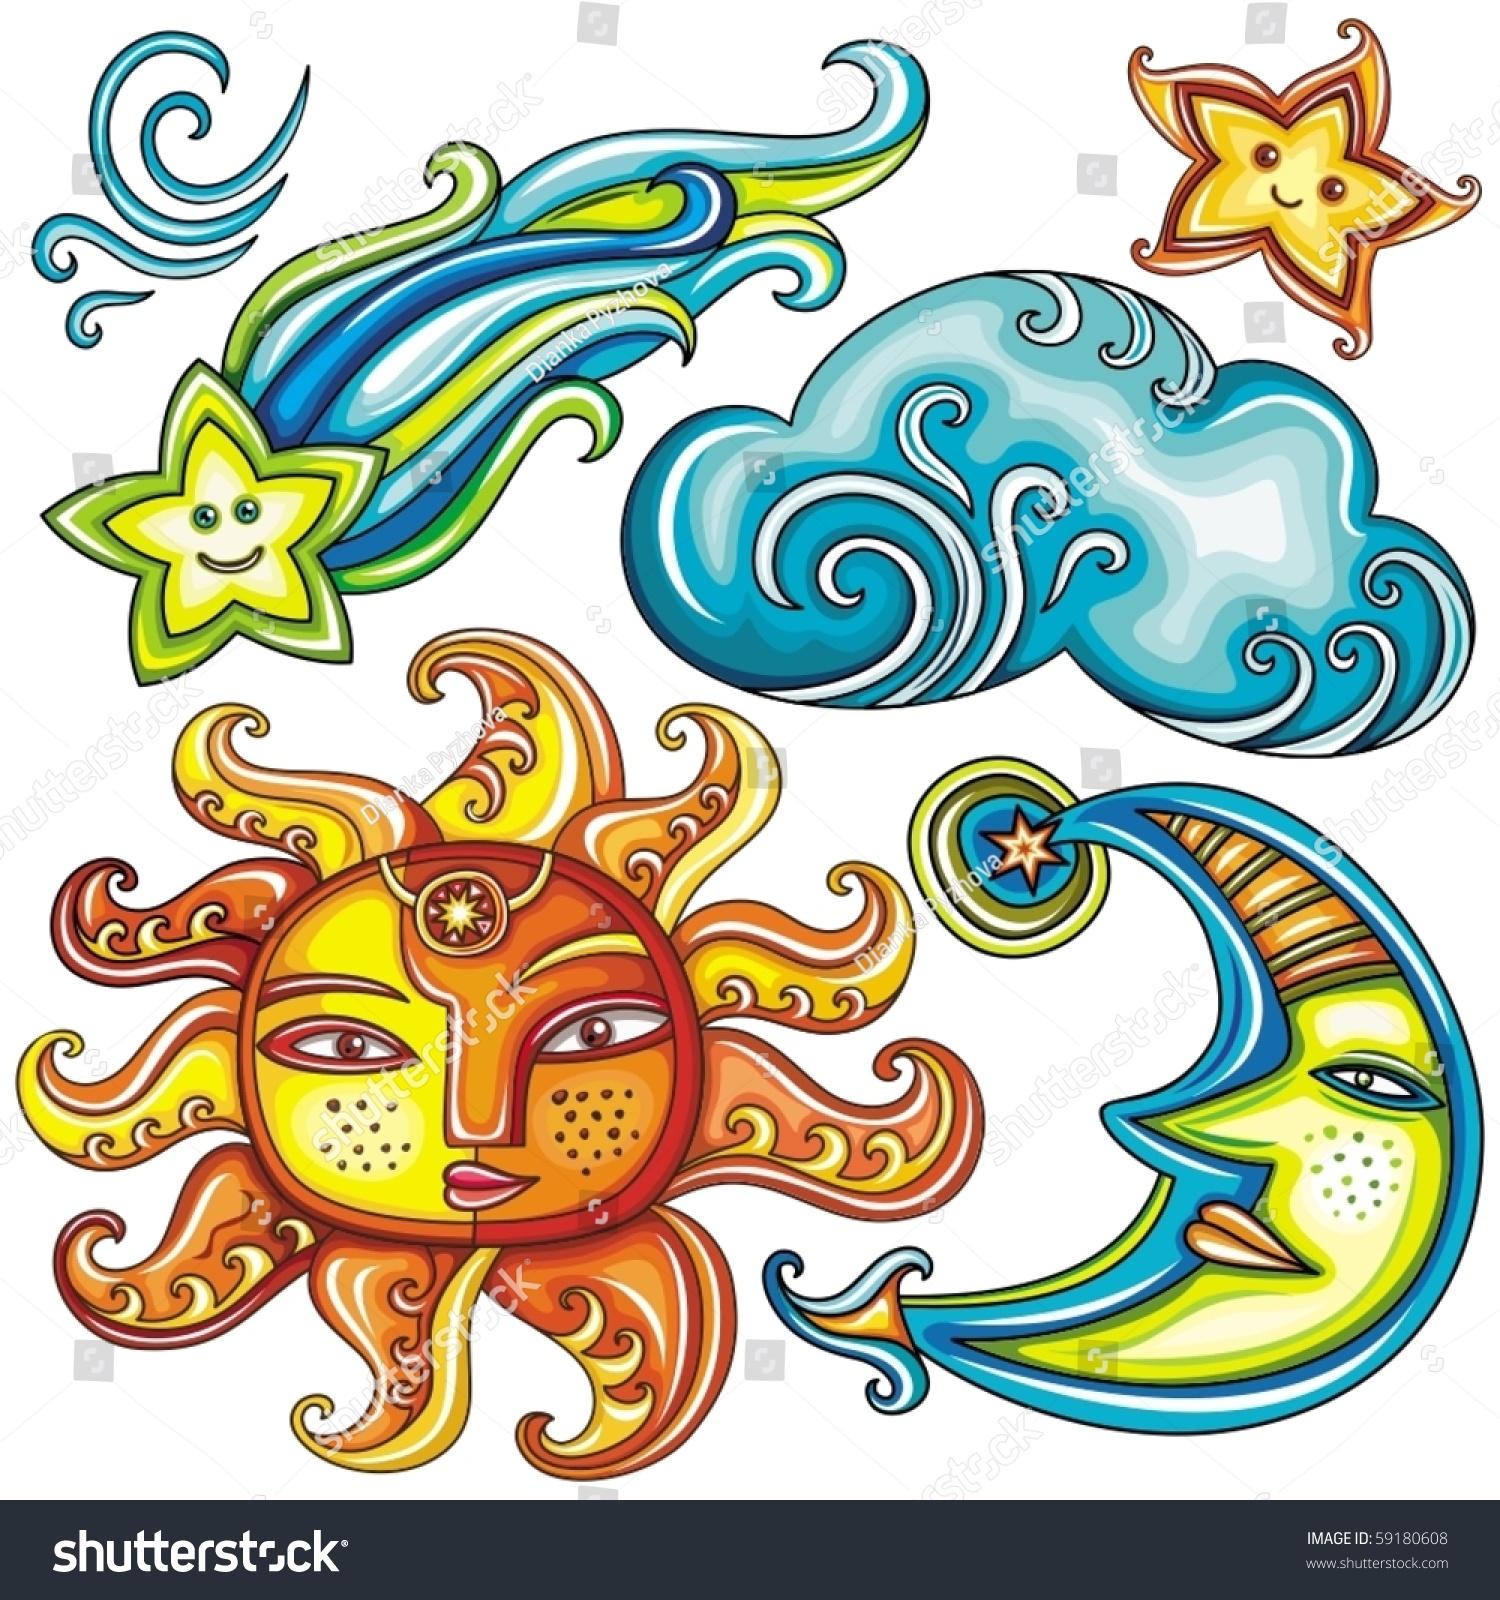 Vector Set Of Celestial Symbols Sun Moon Star Comet